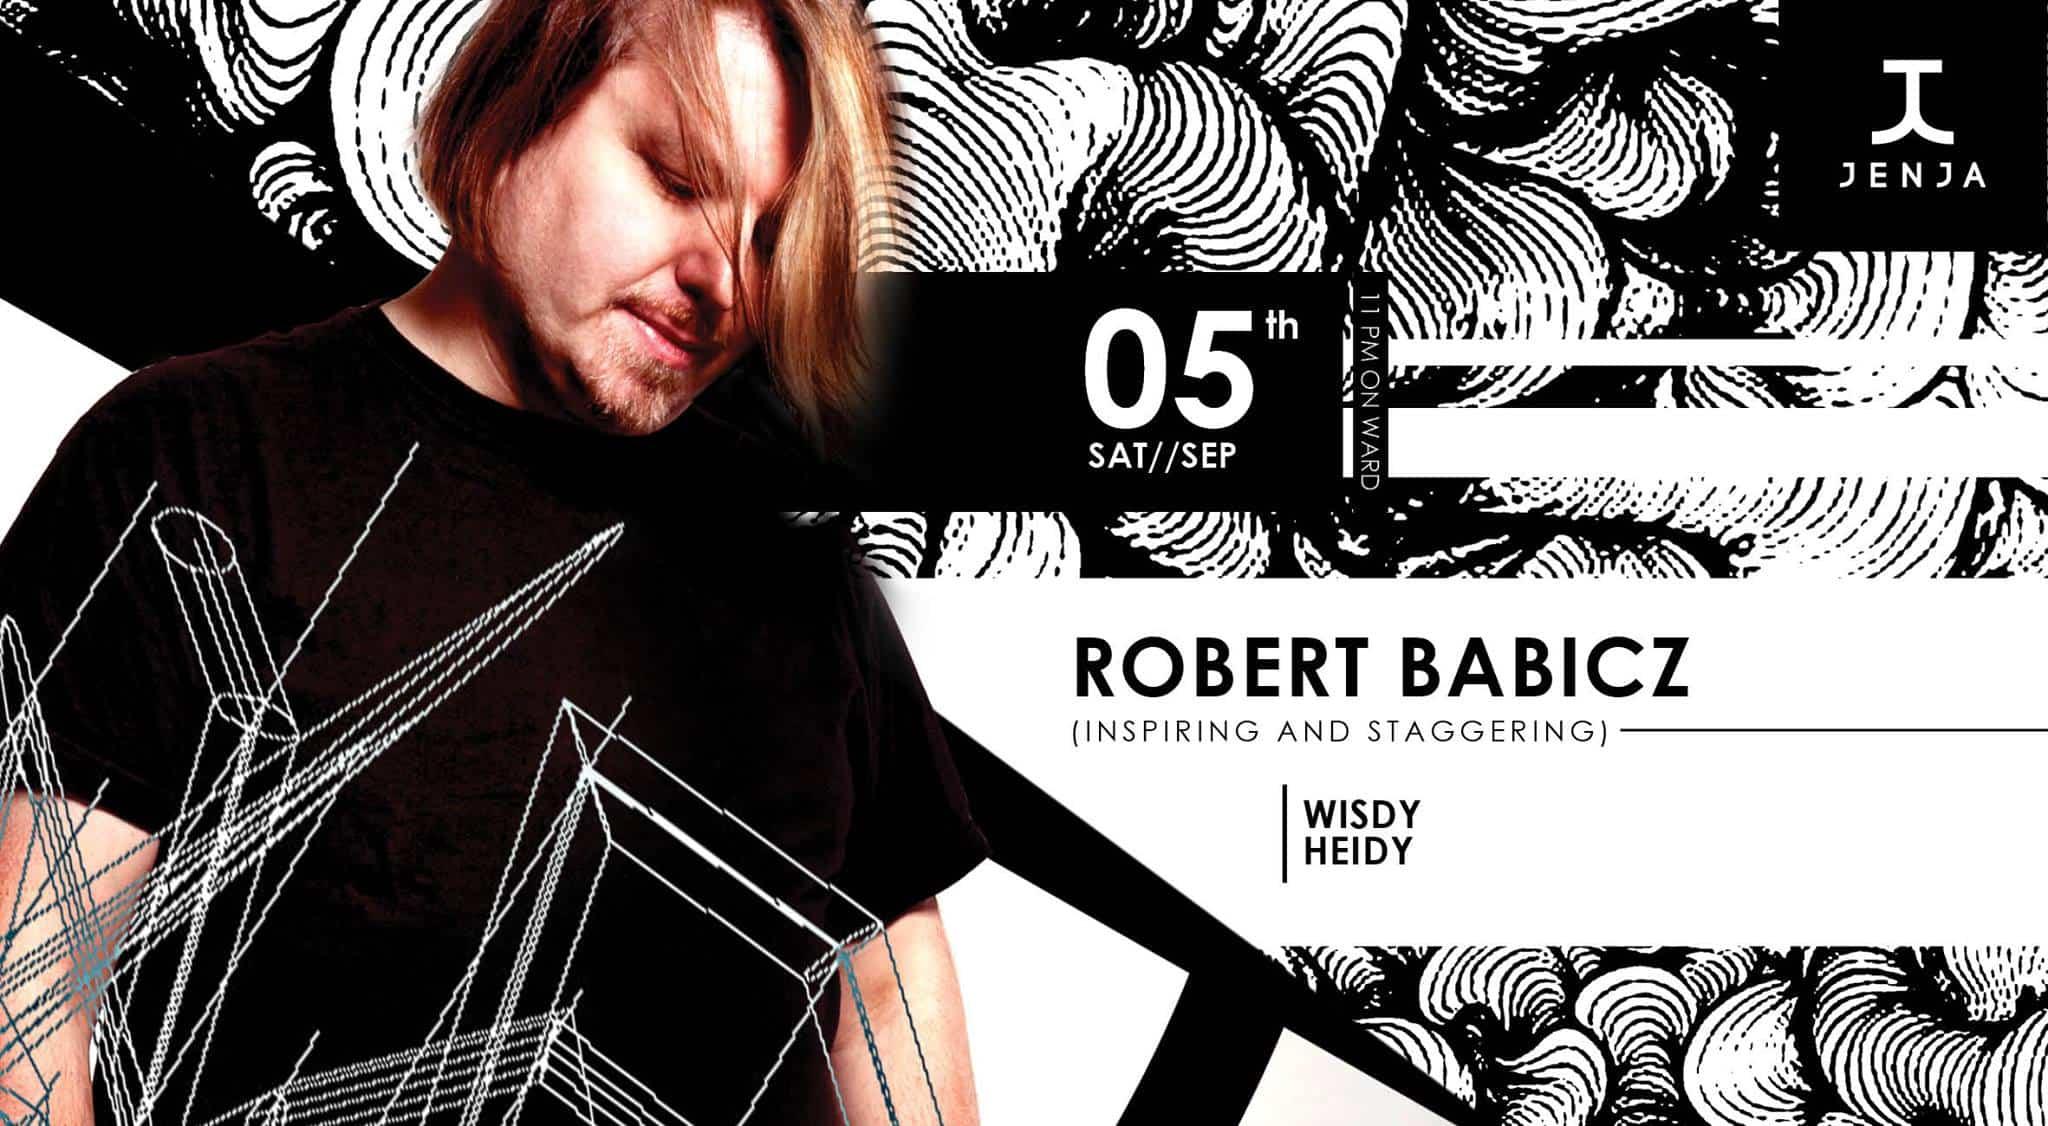 ROBERT BABICZ AT JENJA